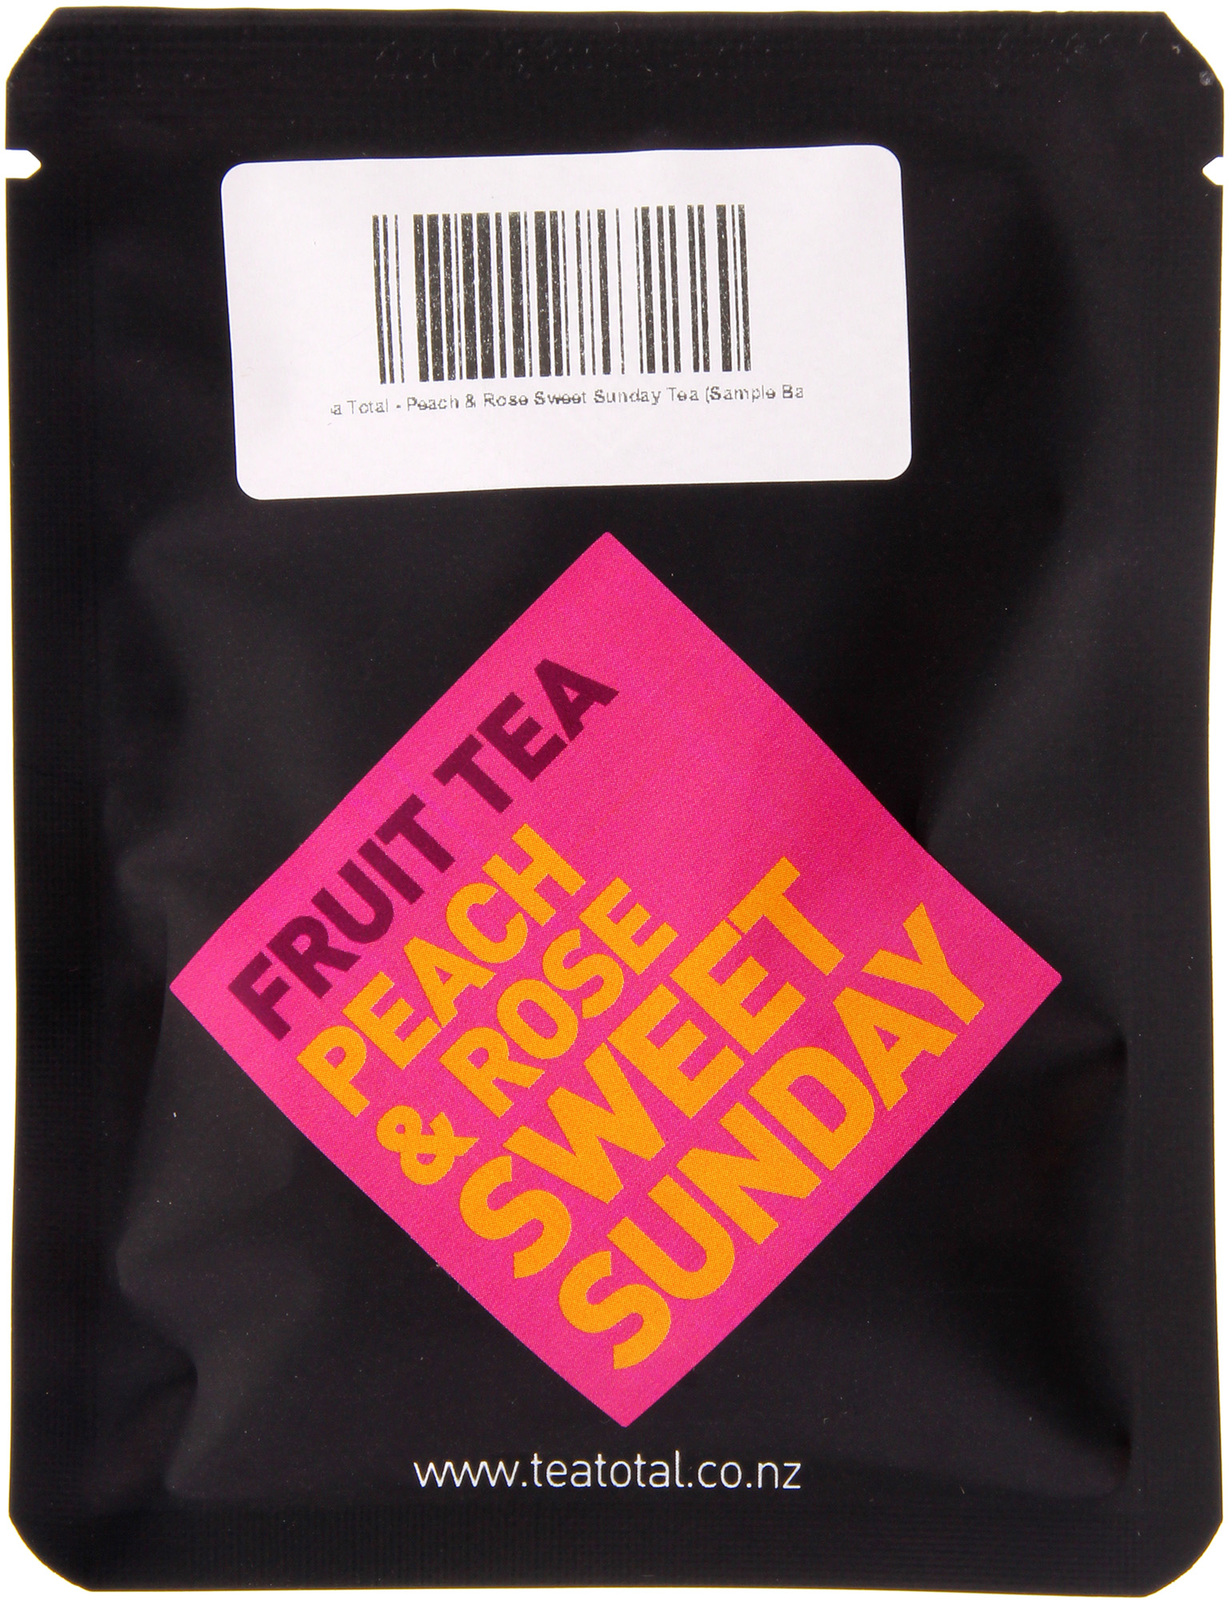 Tea Total - Peach & Rose Sweet Sunday Tea (Sample Bag) image